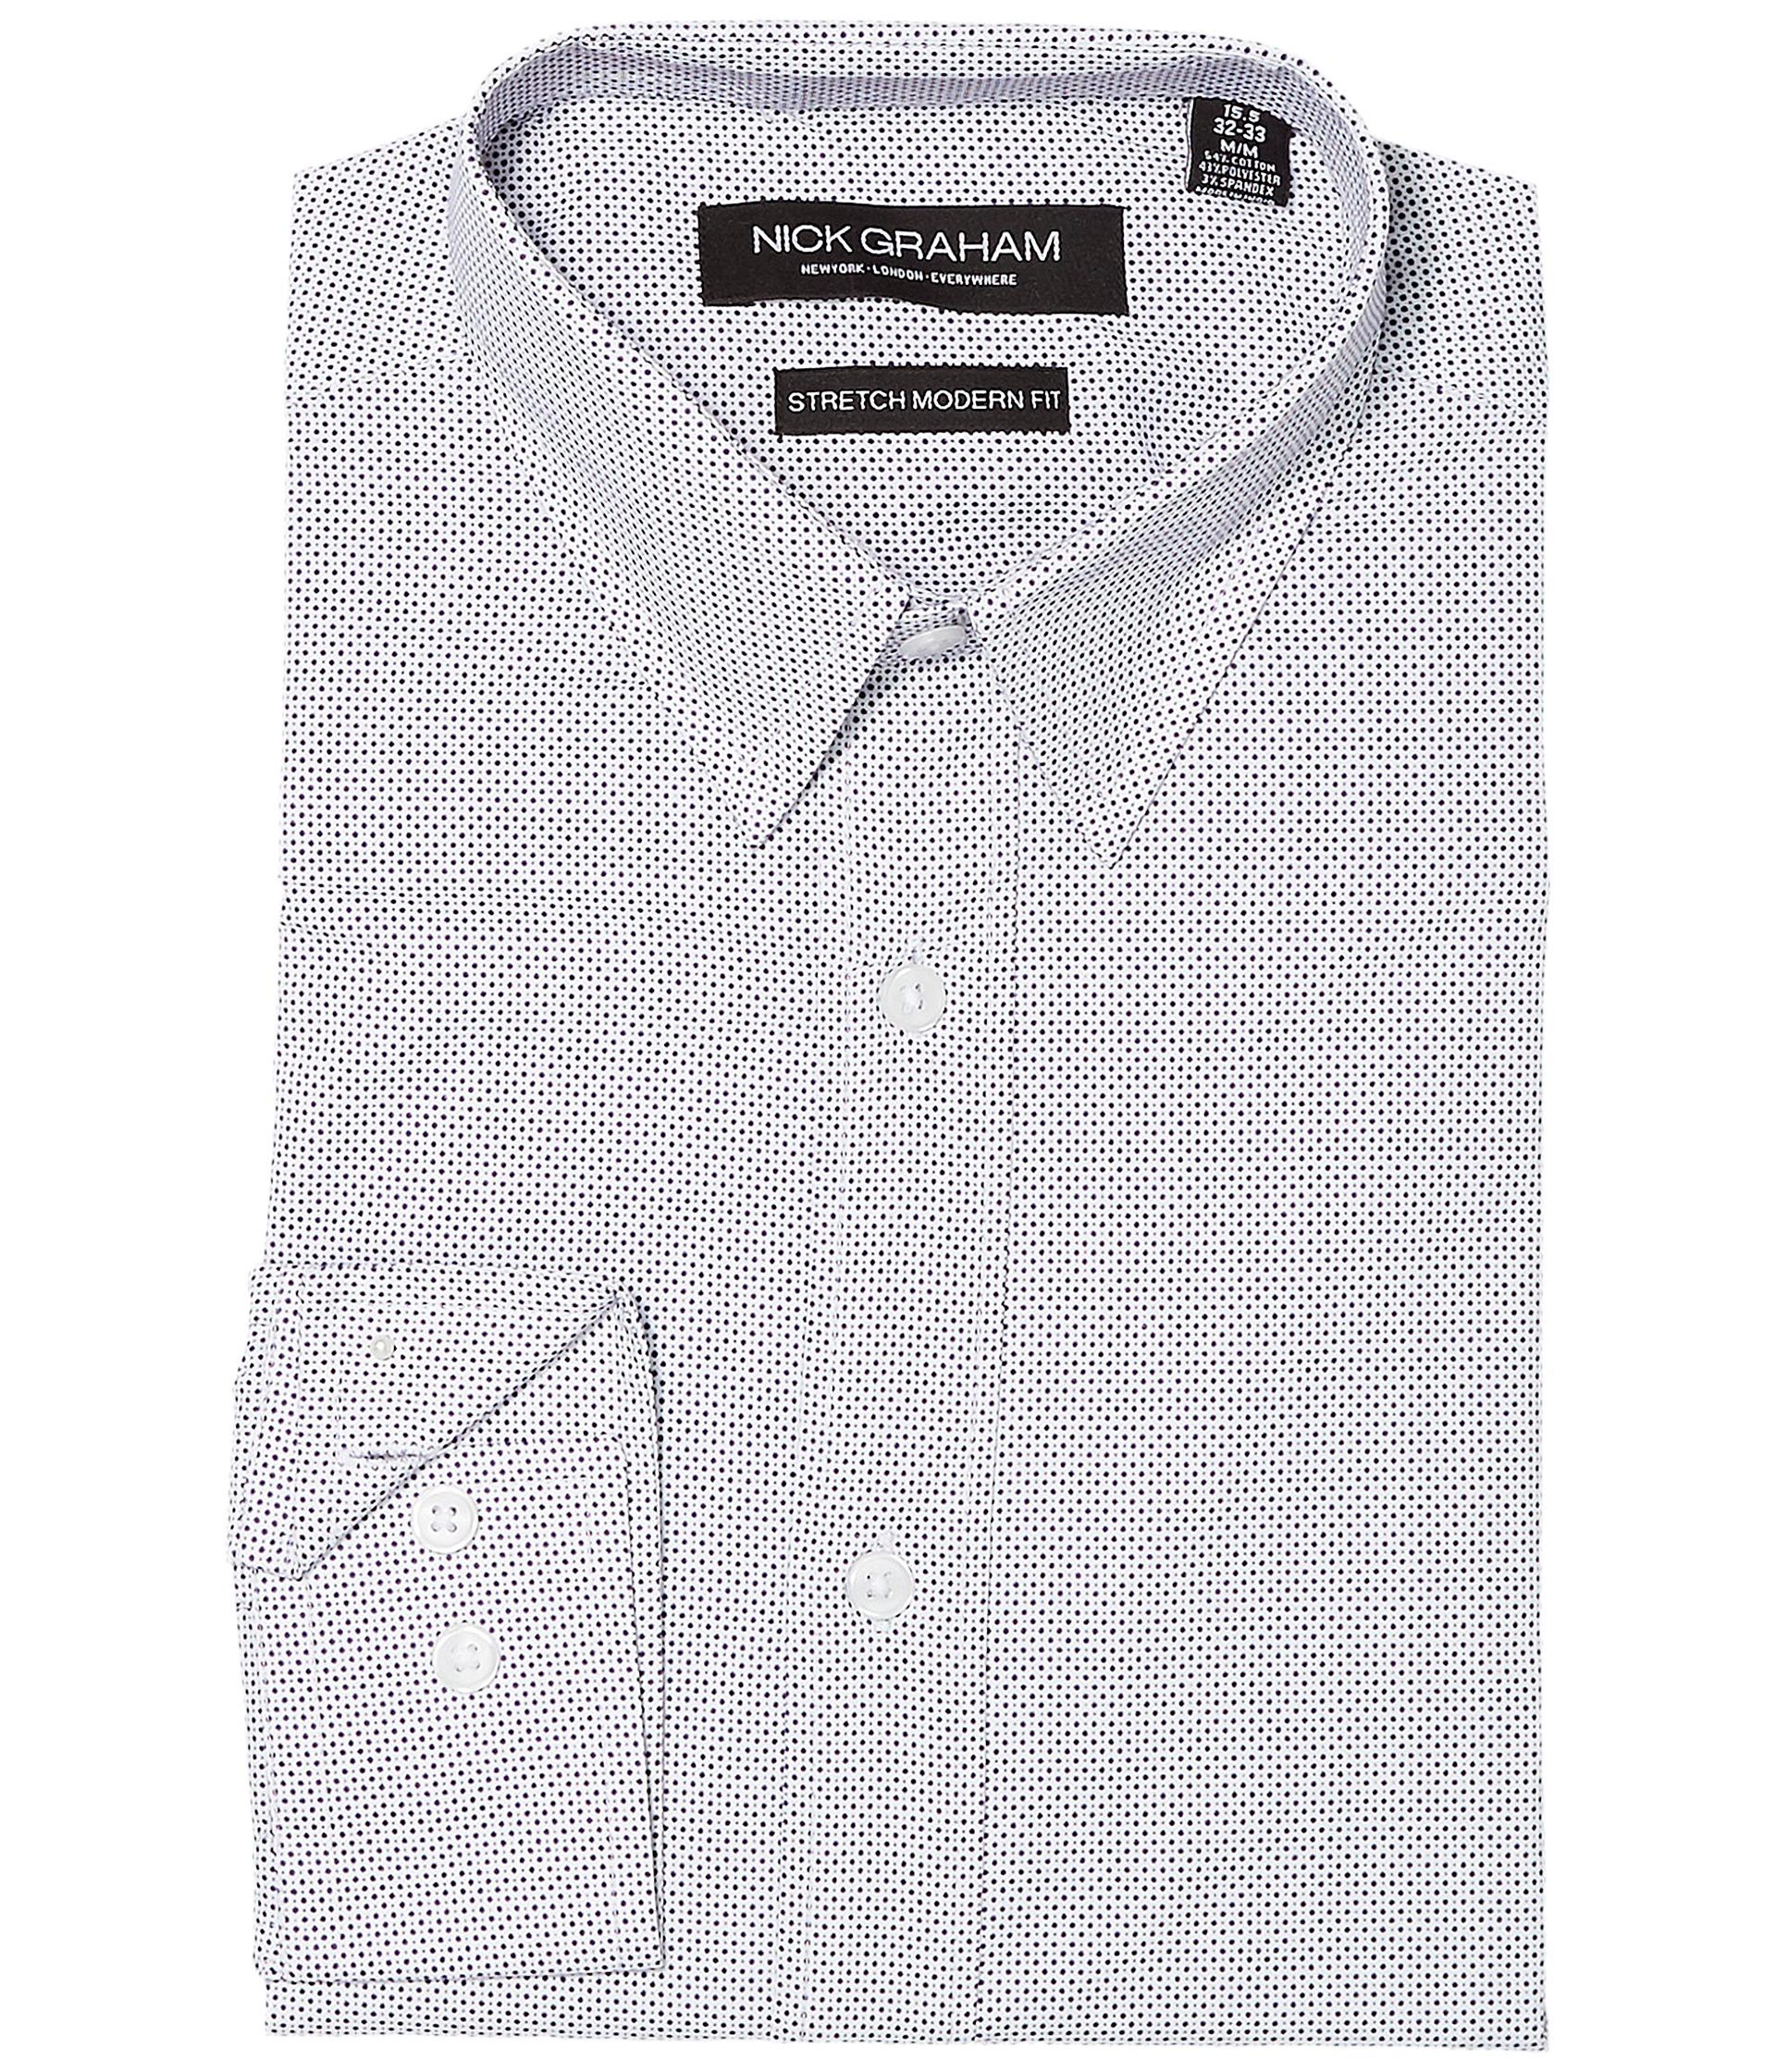 Nick graham dot print stretch dress shirt at for How to stretch a dress shirt